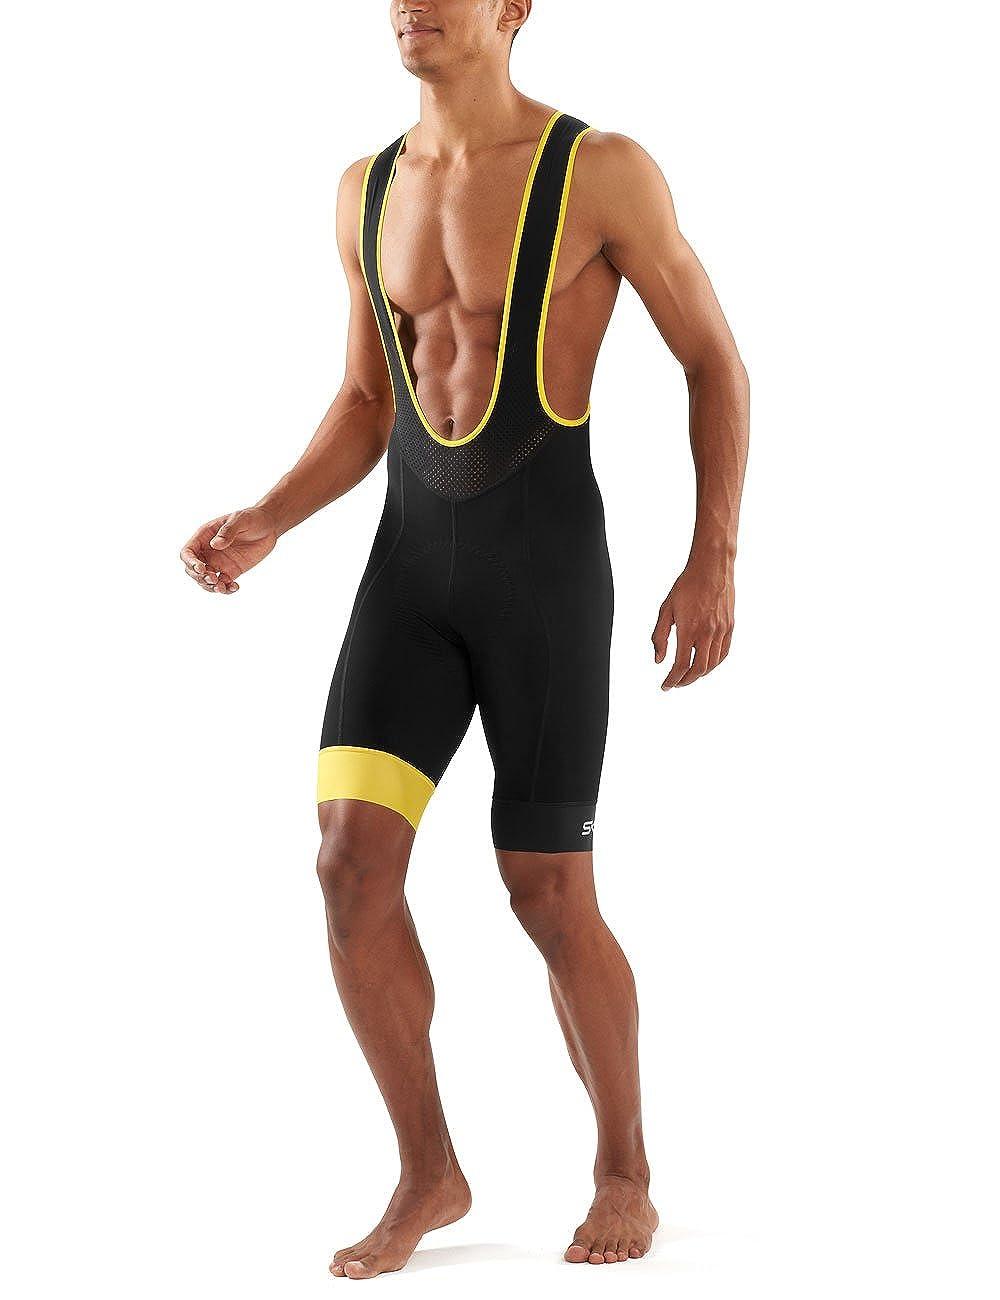 Skins Mens Dynamic Cycle Compression Bib Shorts